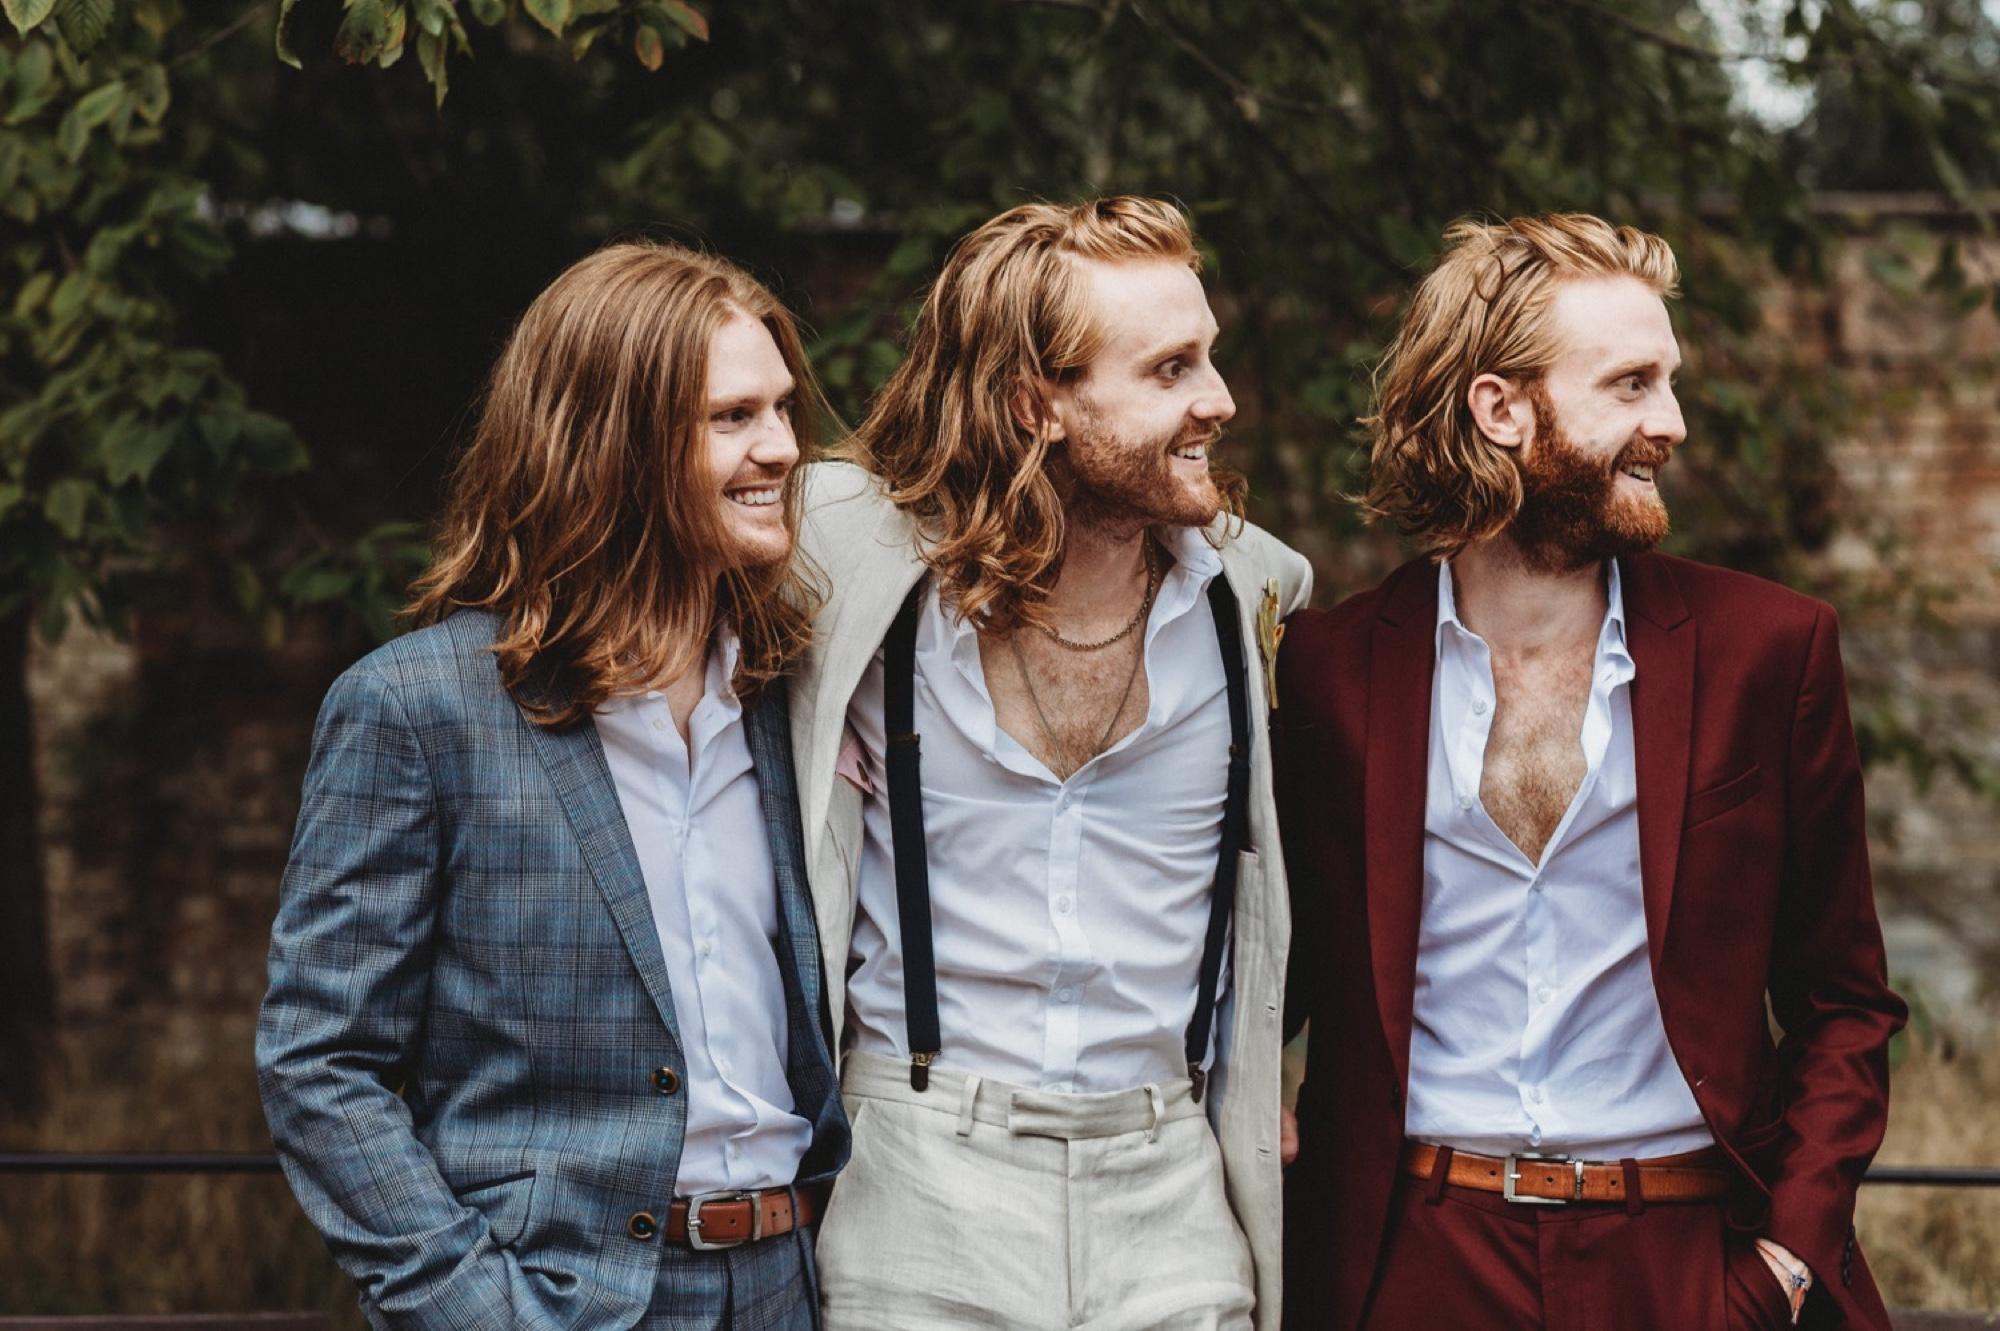 London wedding groomsmen by zakas photography